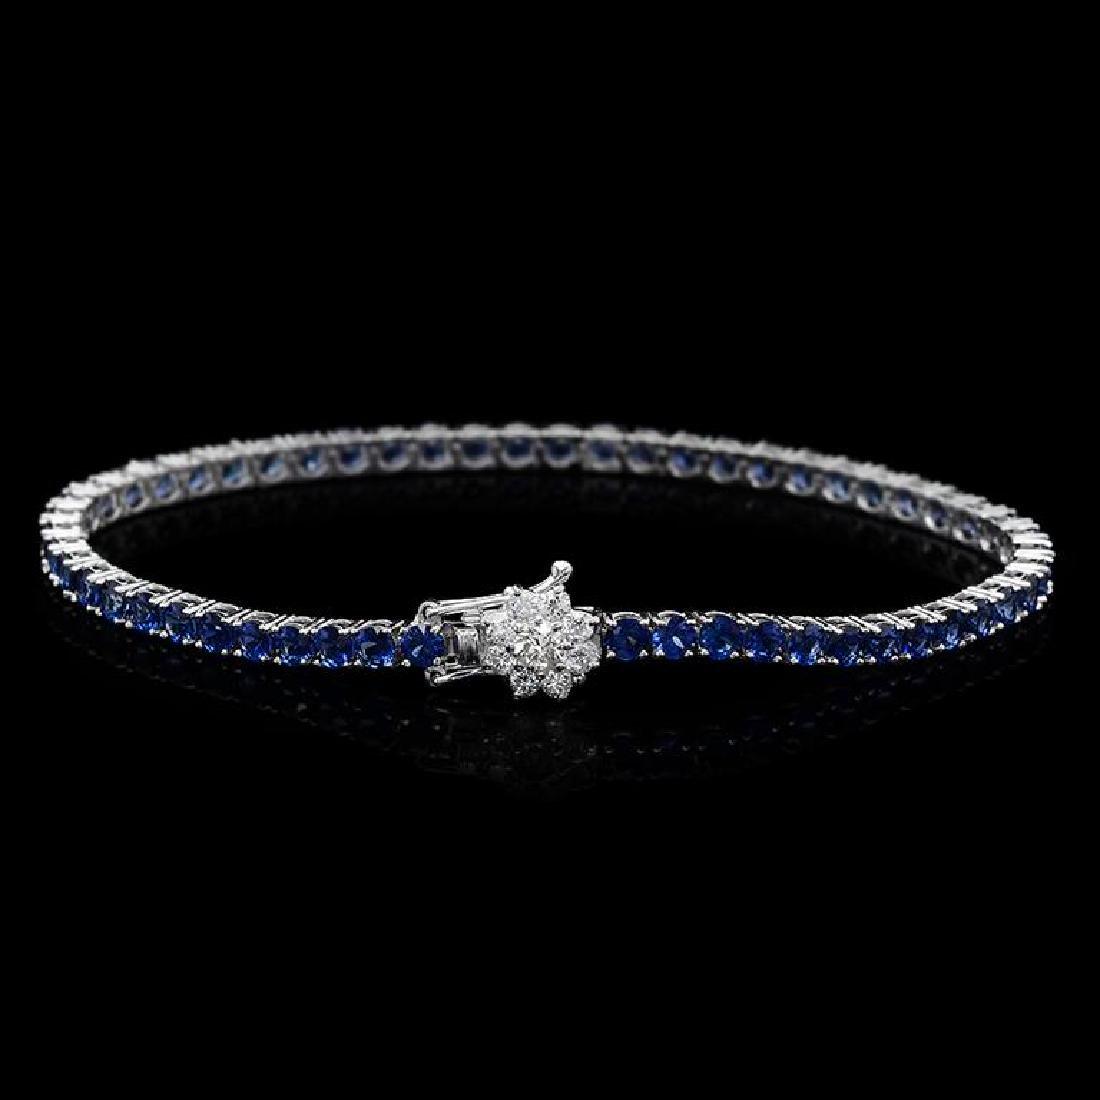 14K Gold 7.11ct Sapphire 0.57ct Diamond Bracelet